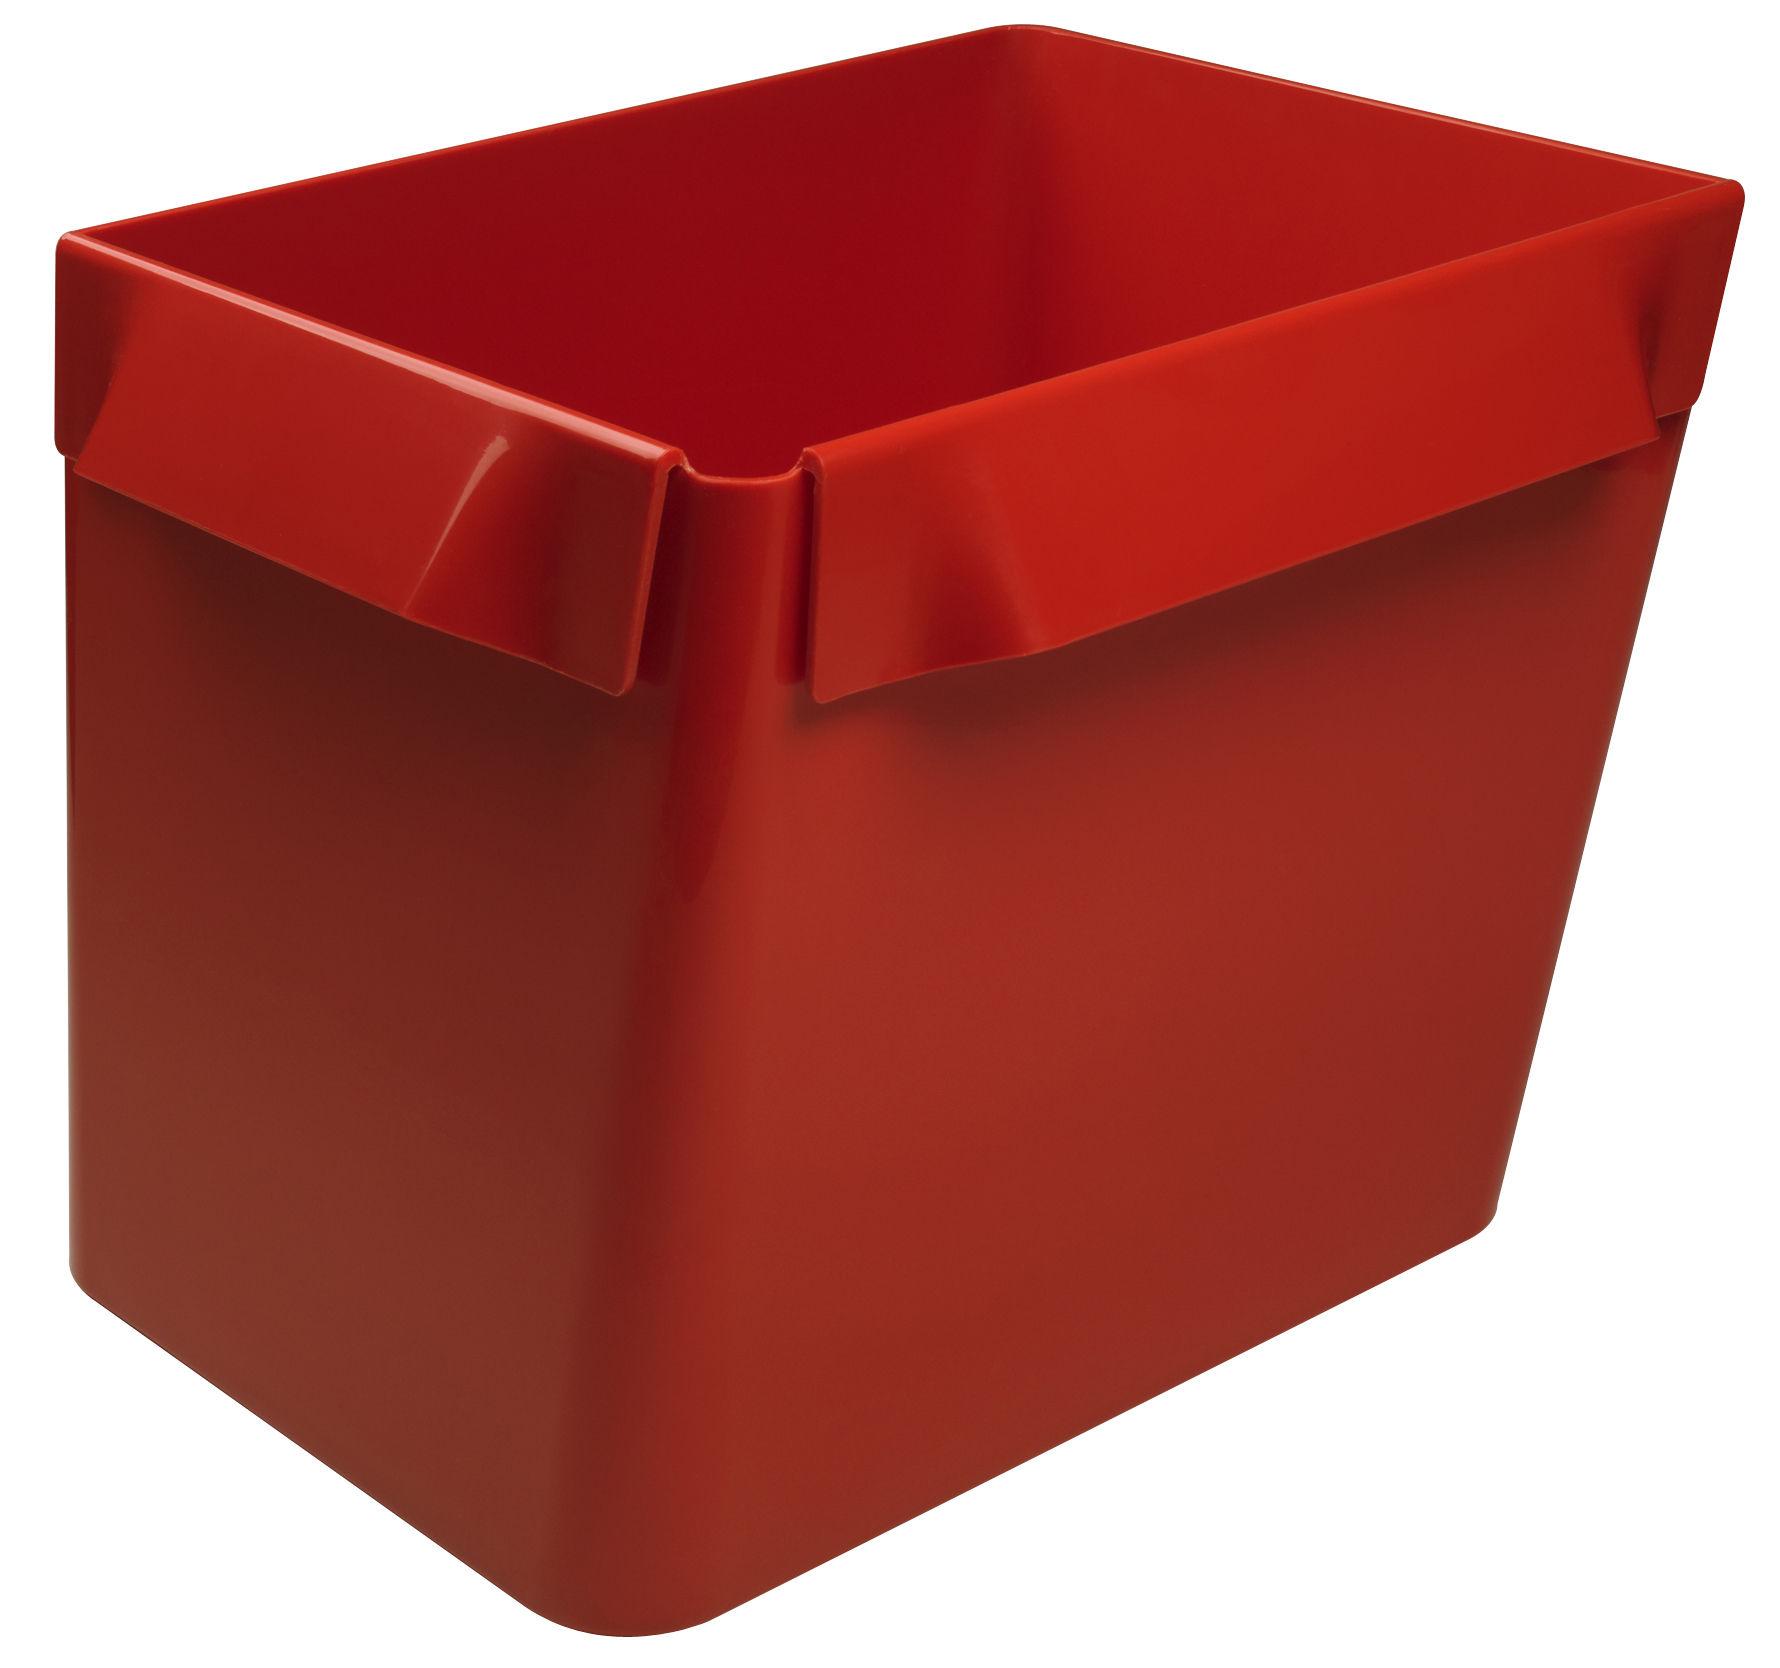 Küche - Körbe - Big Bin Korb Modulares Regalsystem - Authentics - Rot - ABS